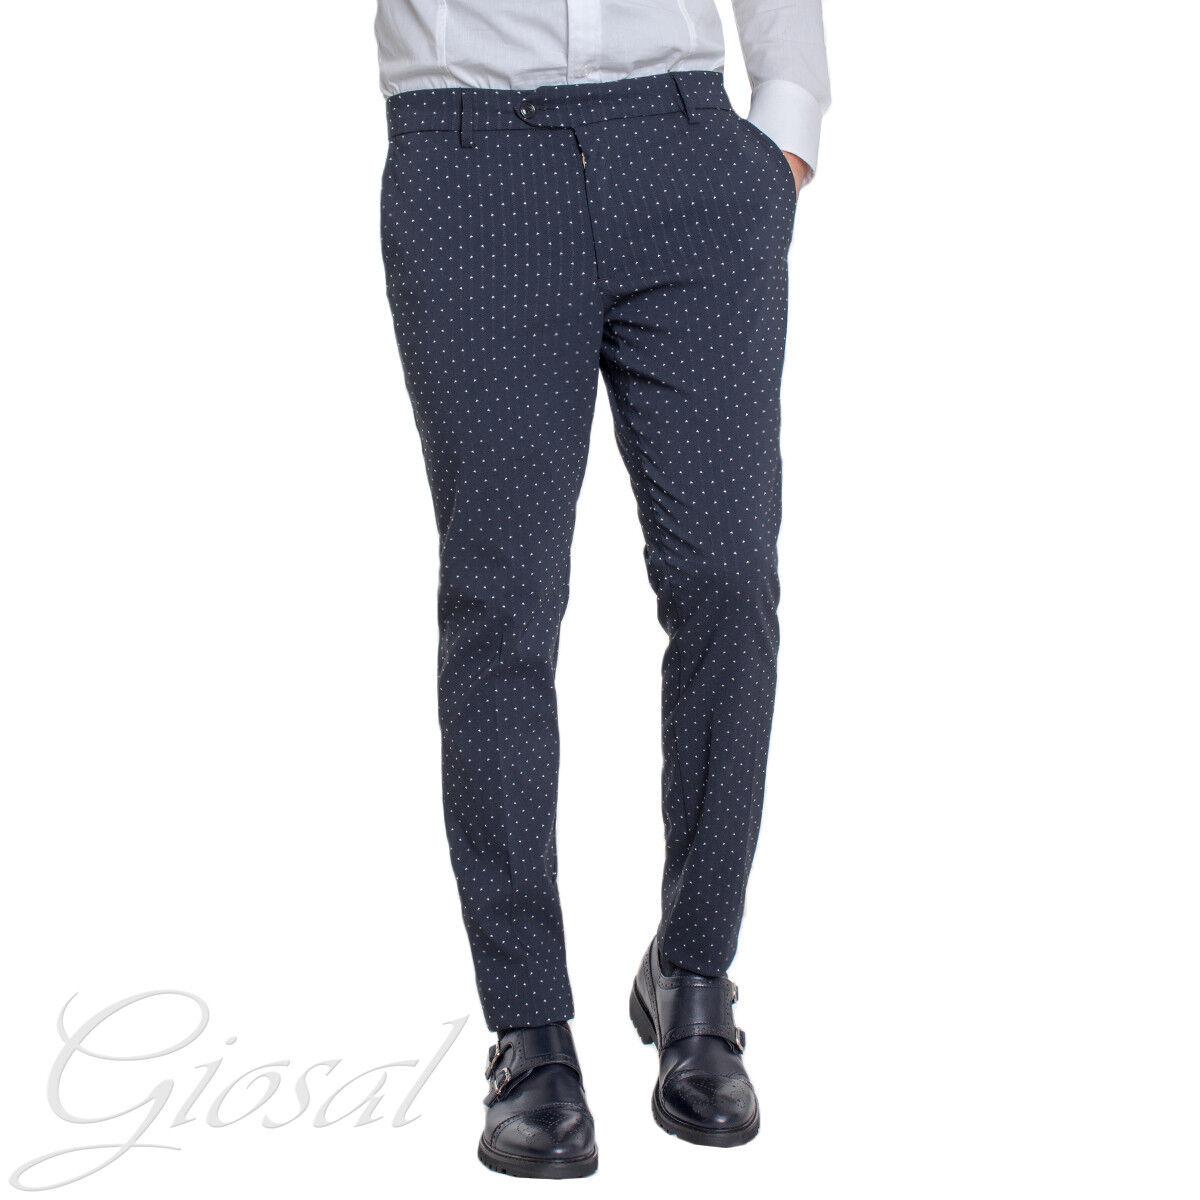 Pantalone men Classico Pois blue Tasca America Elegante GIOSAL